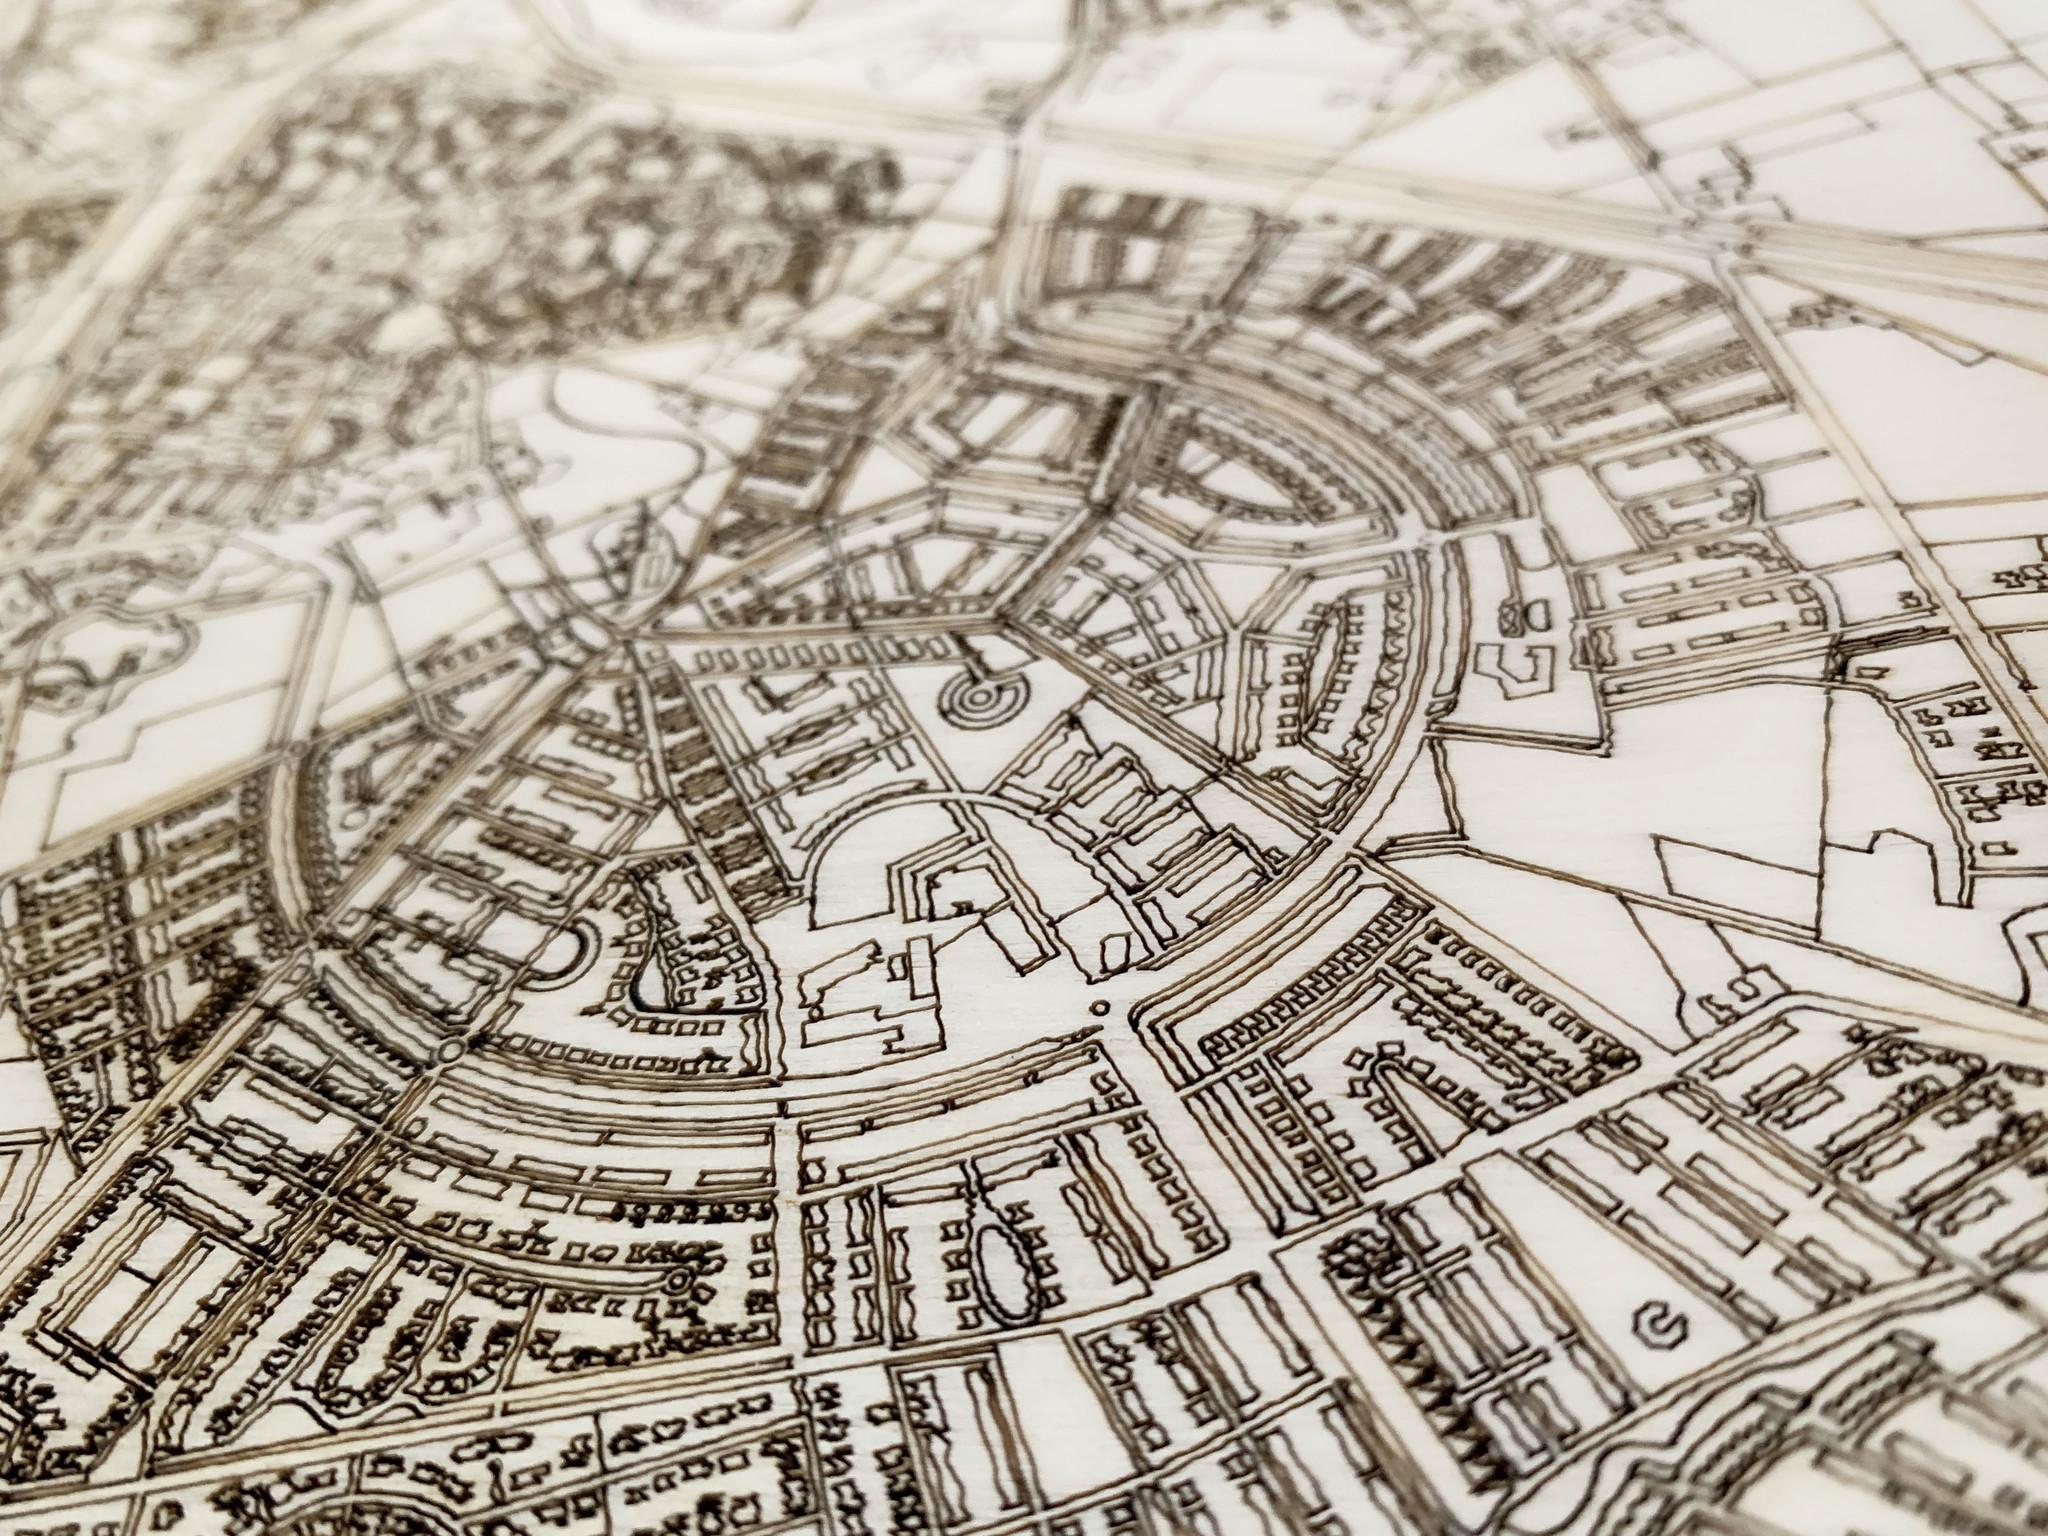 Hölzerner Stadtplan Borne-6